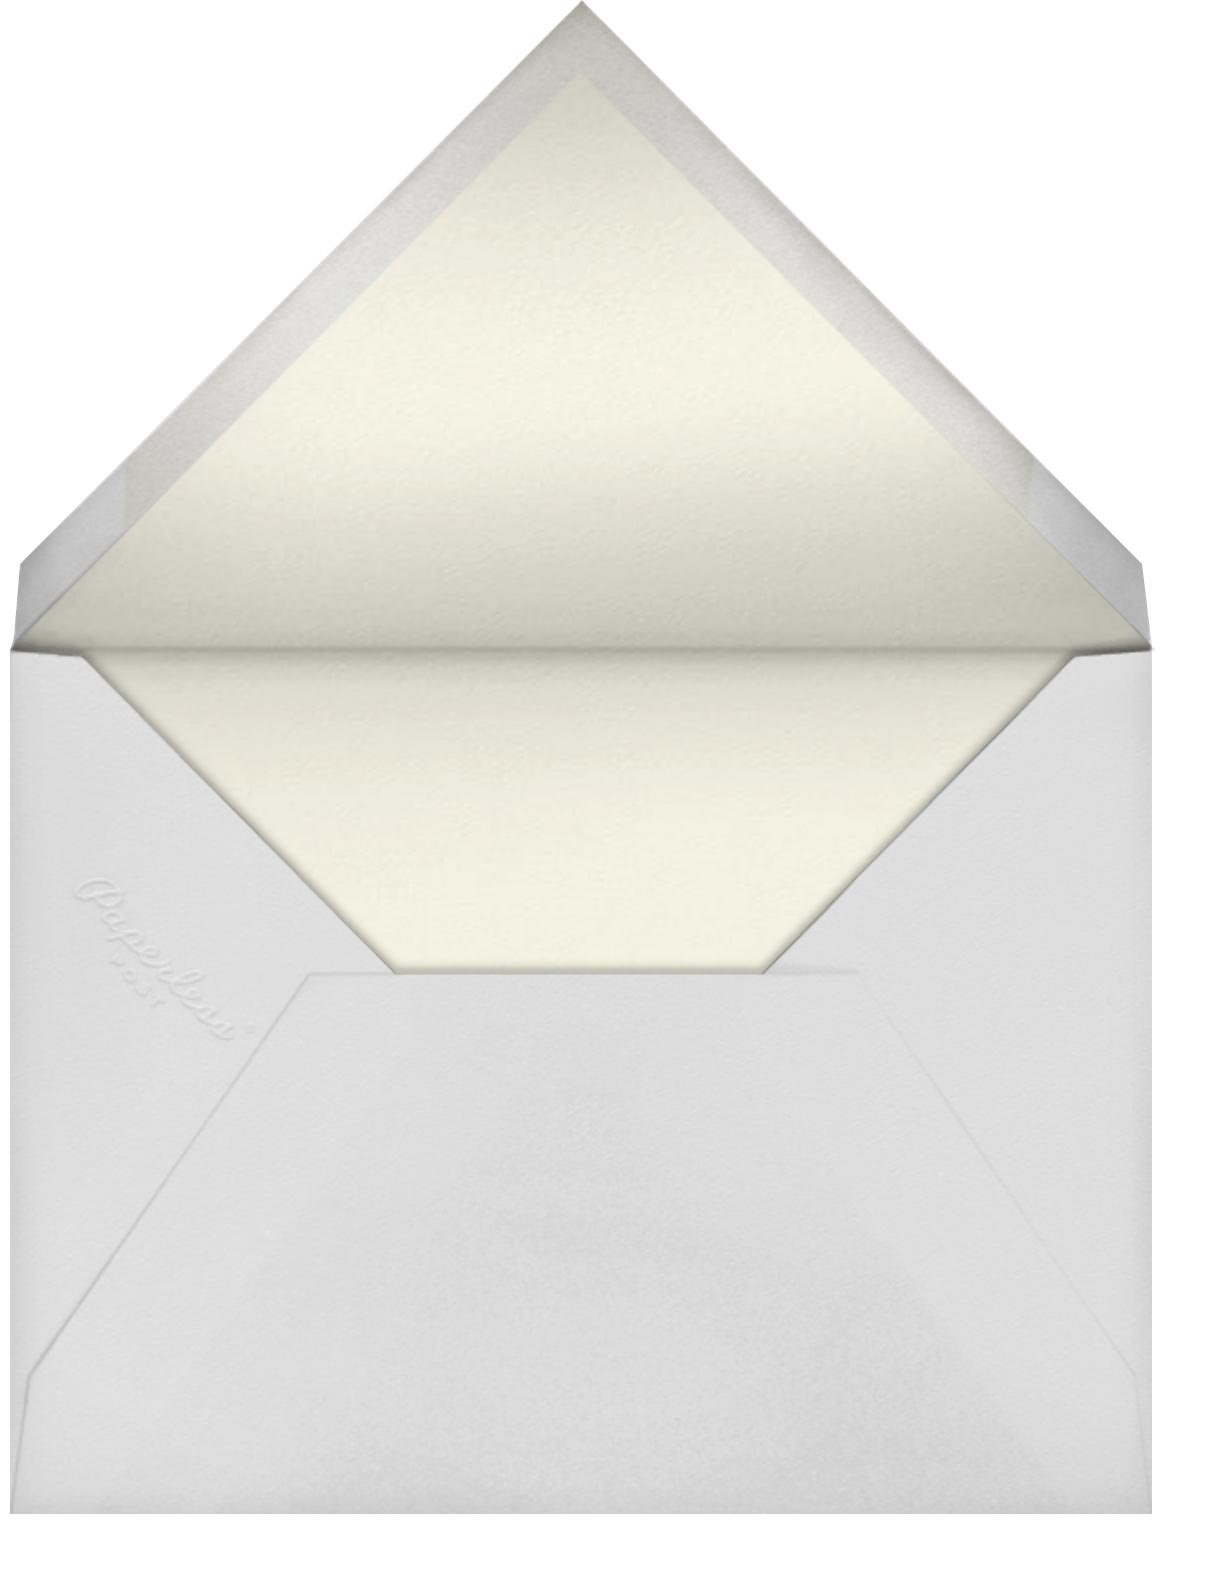 Ars Botanica - Oscar de la Renta - Adult birthday - envelope back